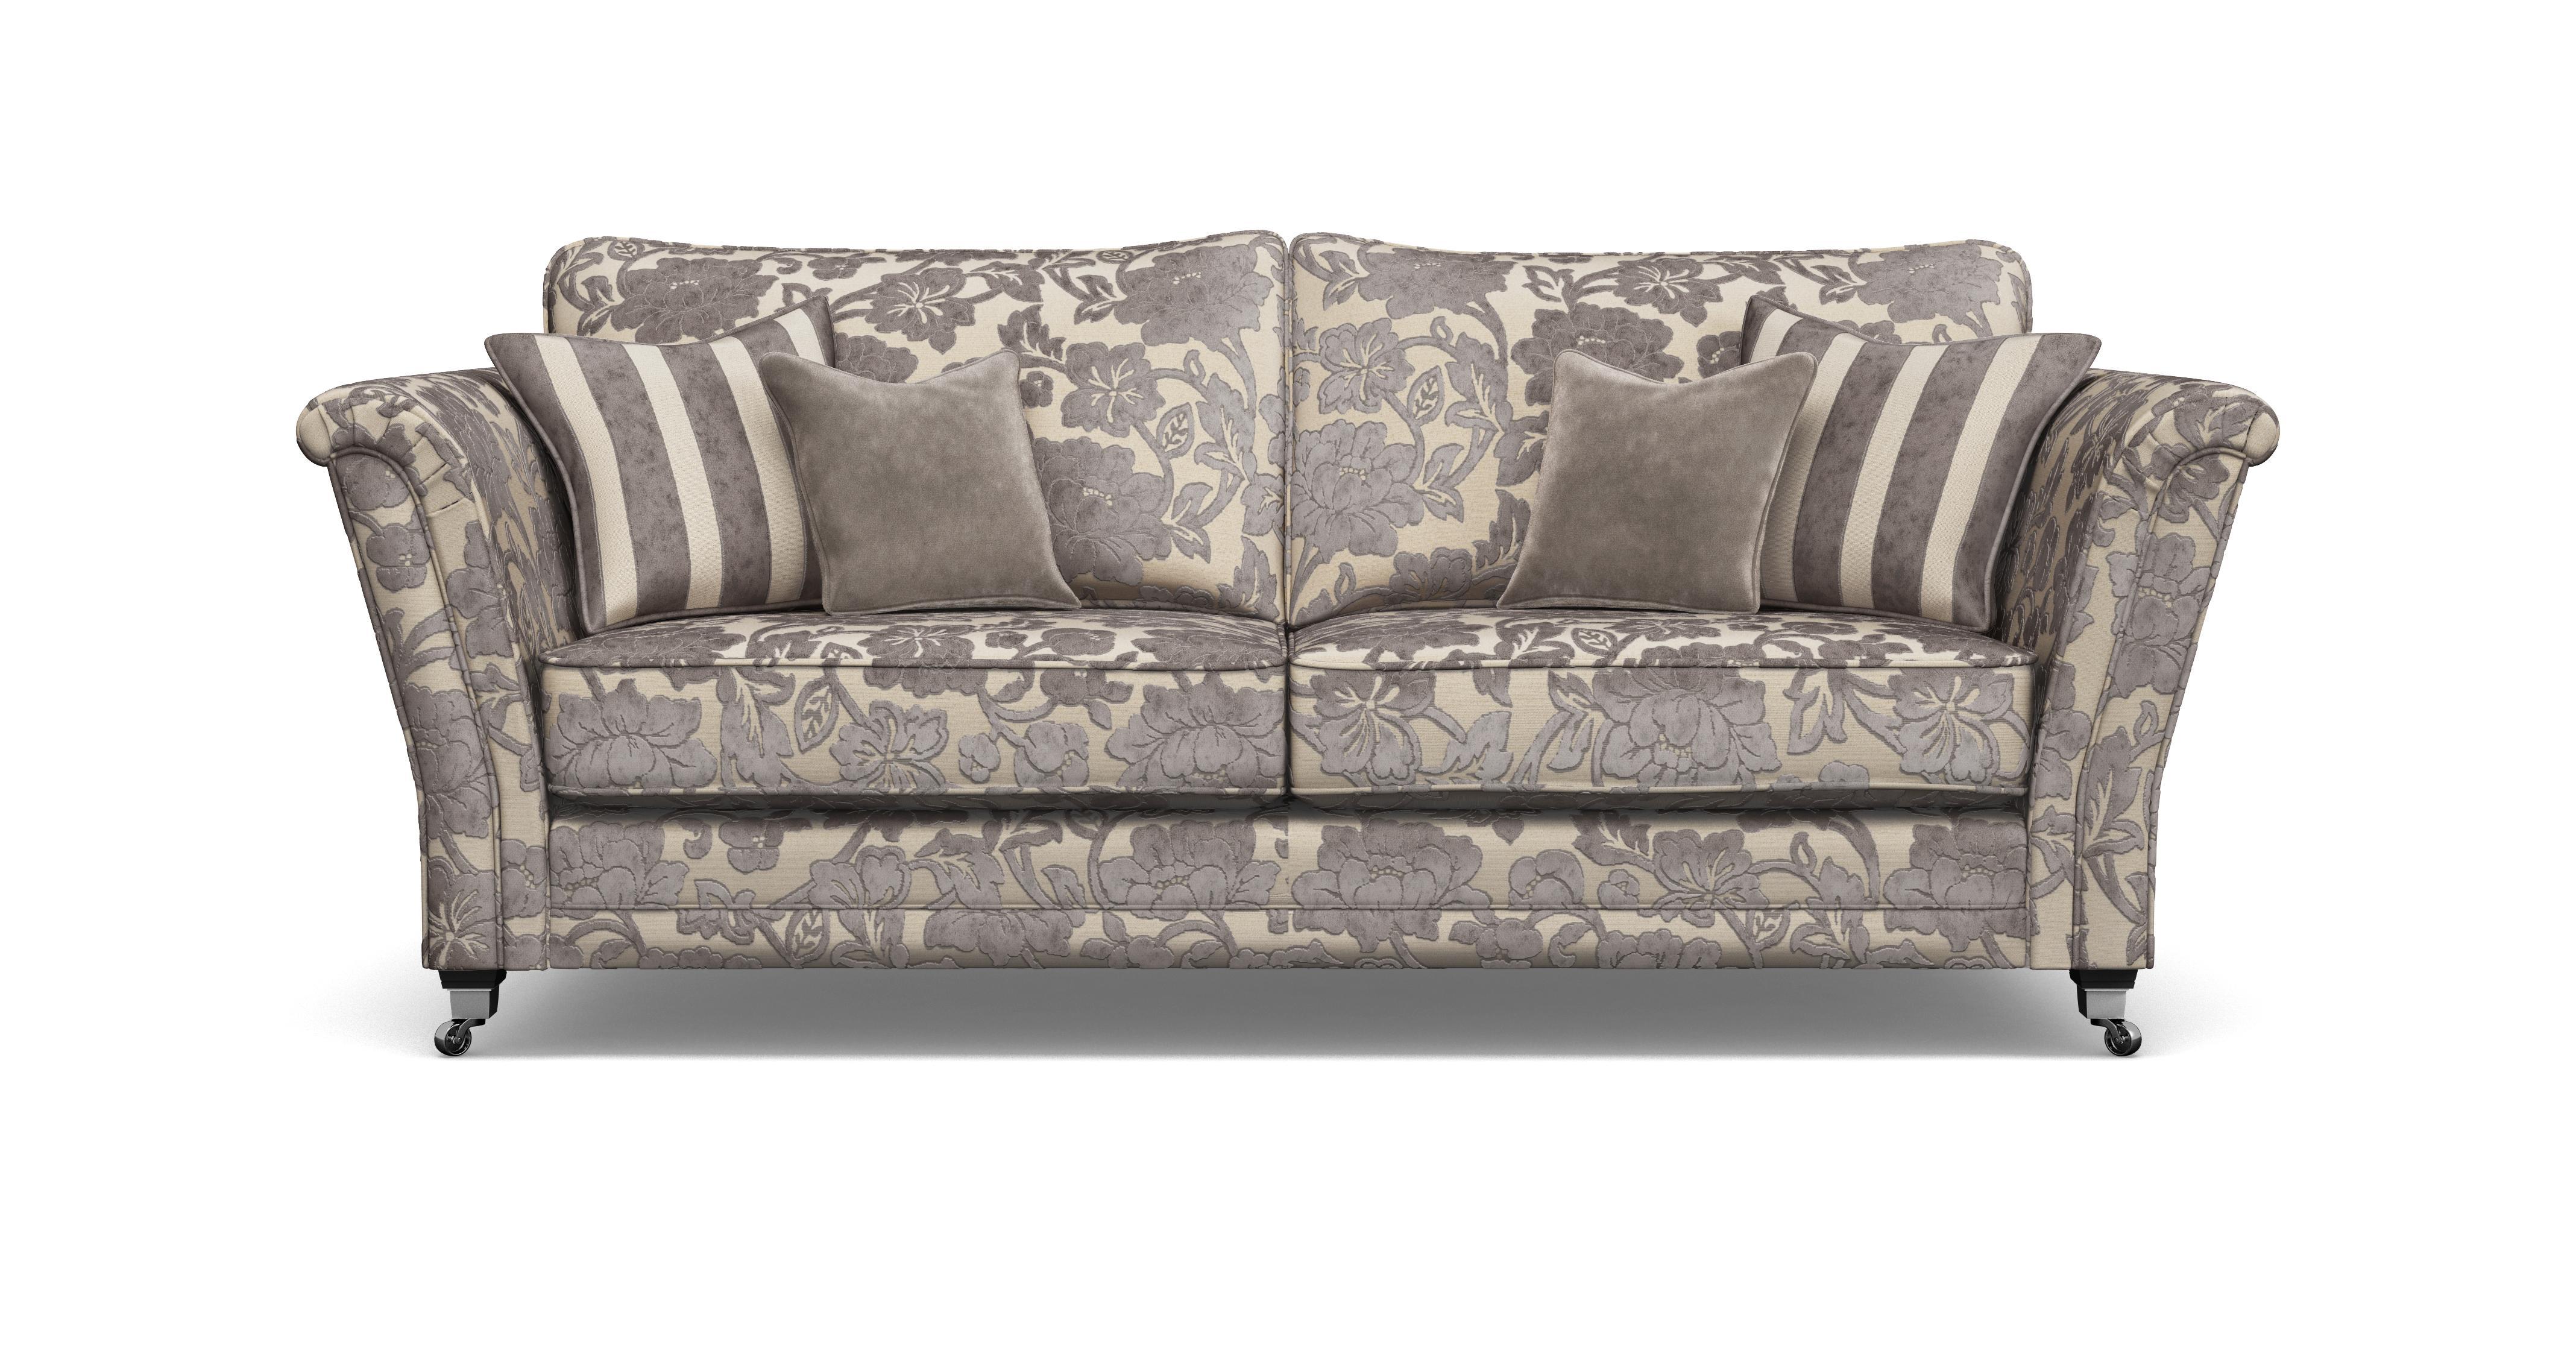 Striped 2 Seater Sofa Hogarth A Hogarthfloral Mink View